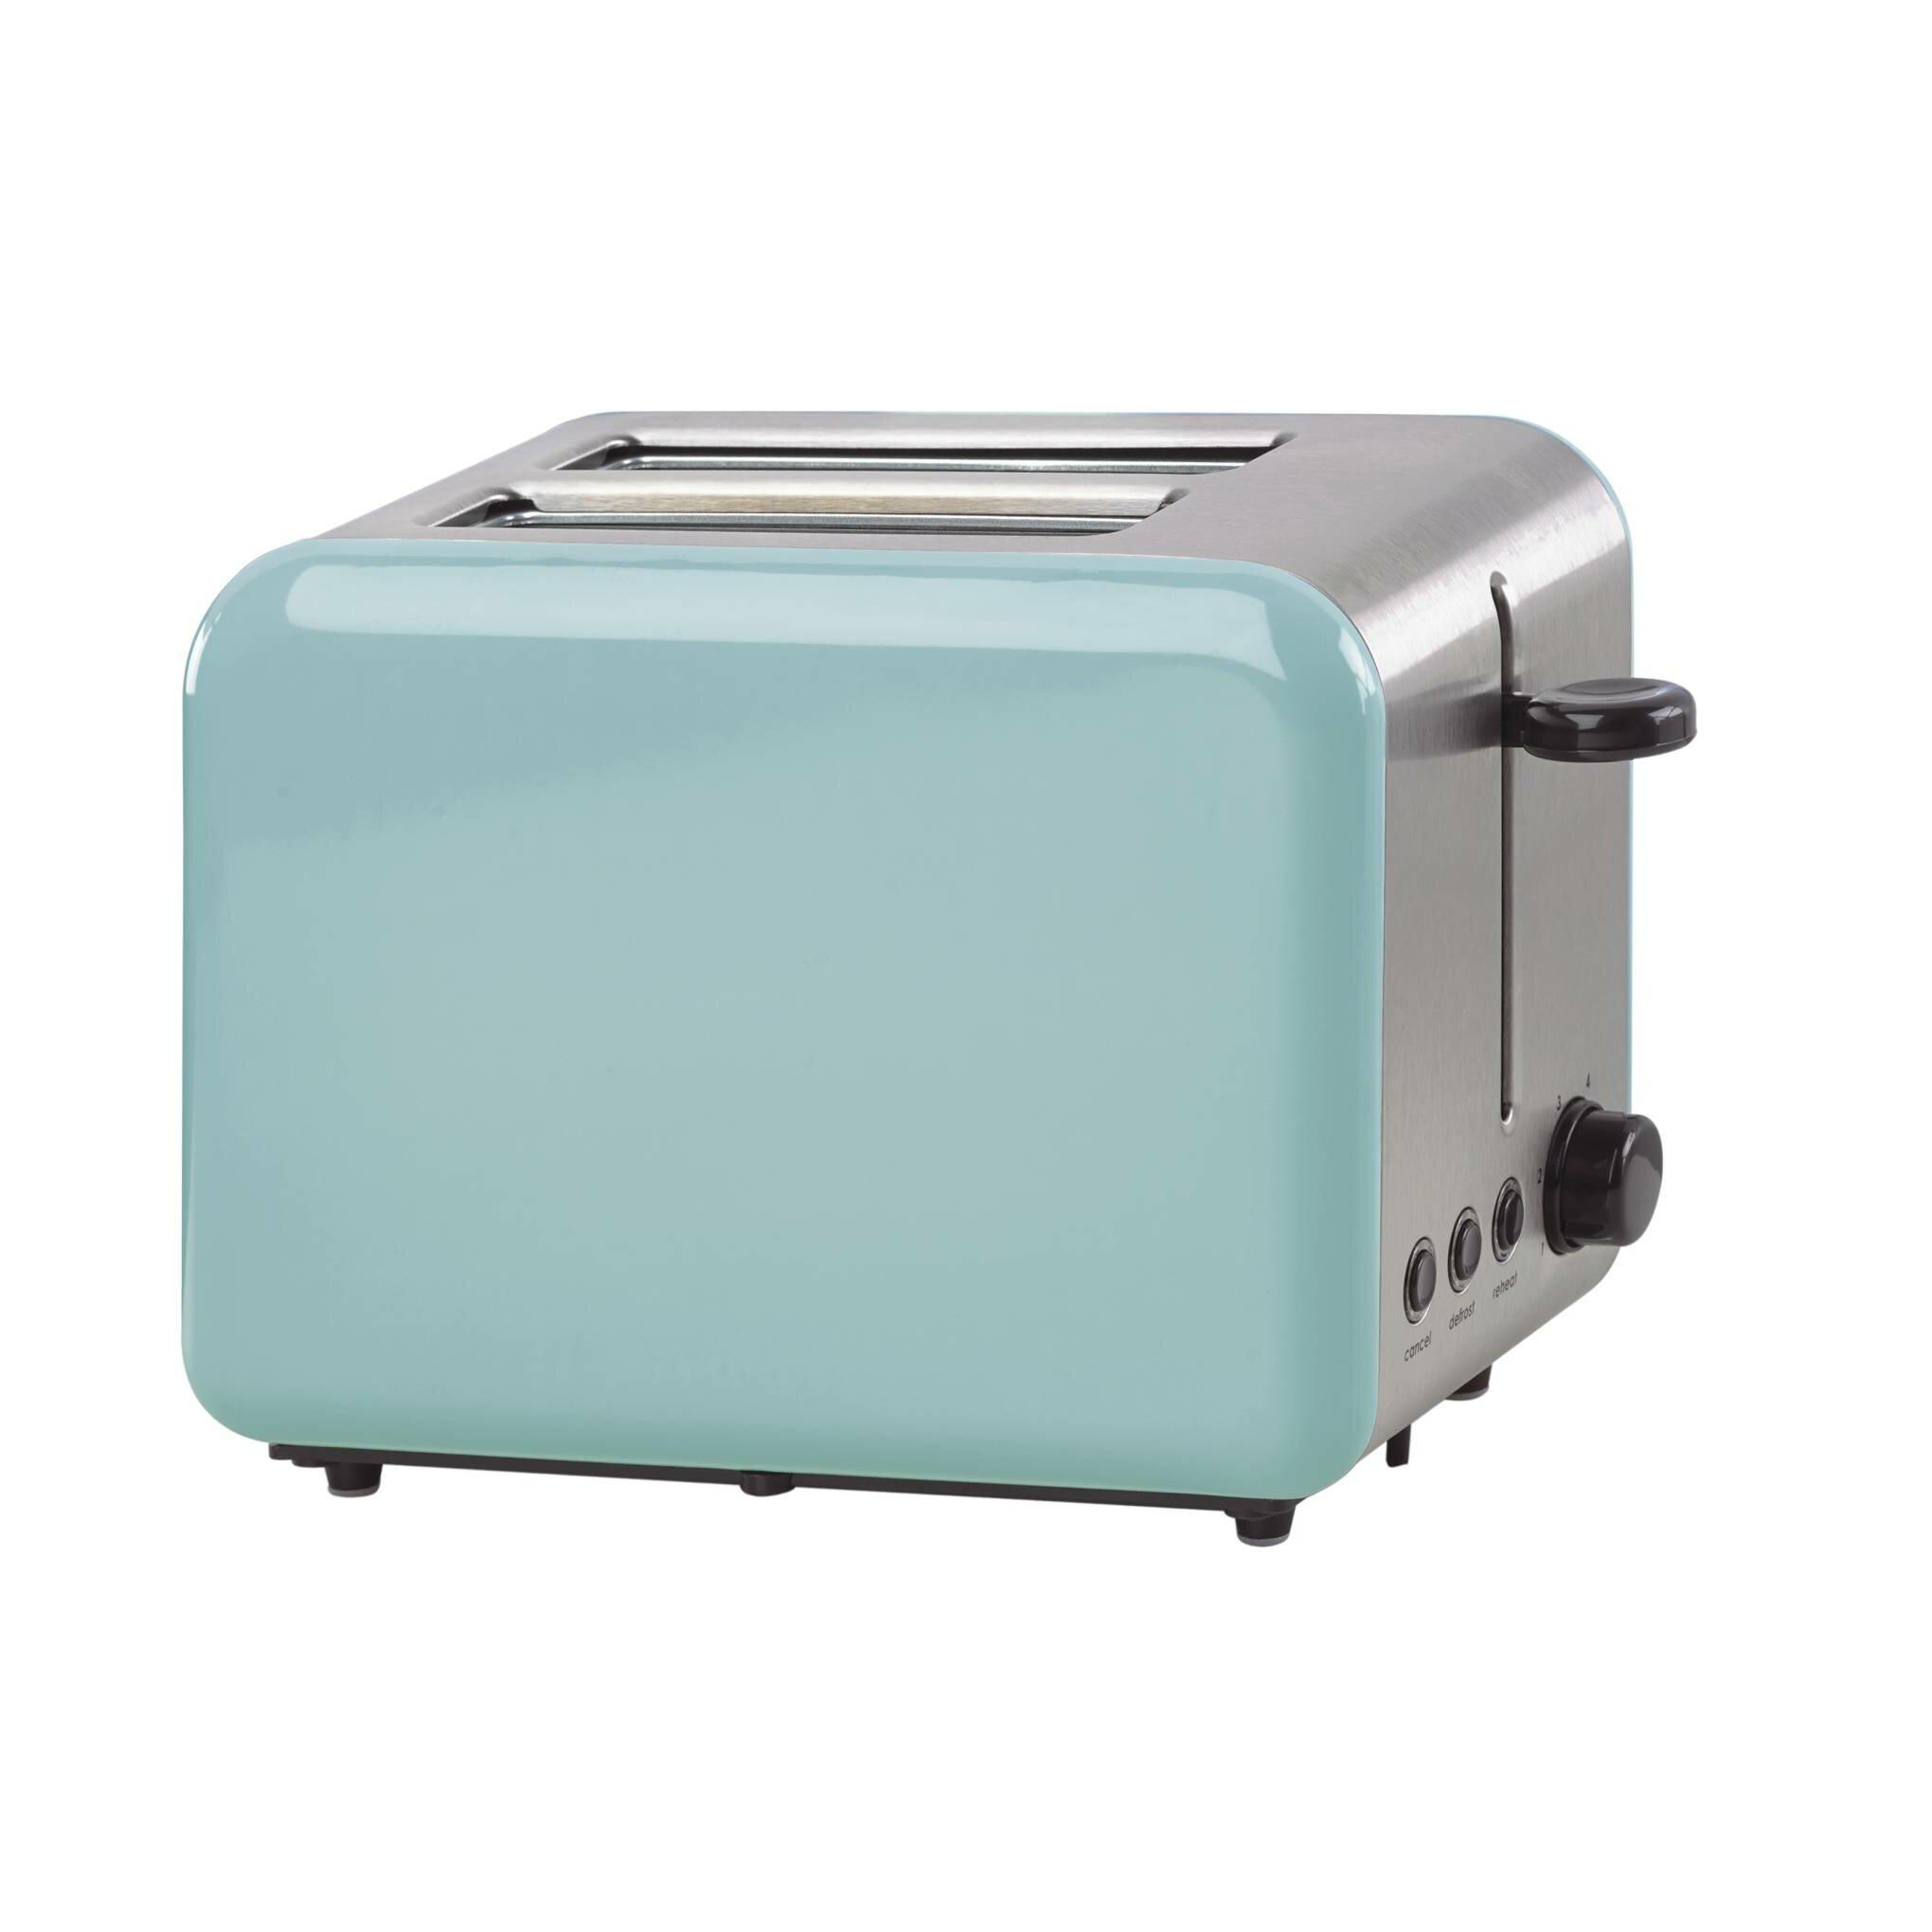 kate spade new york 2 slice all in good taste turquoise toaster